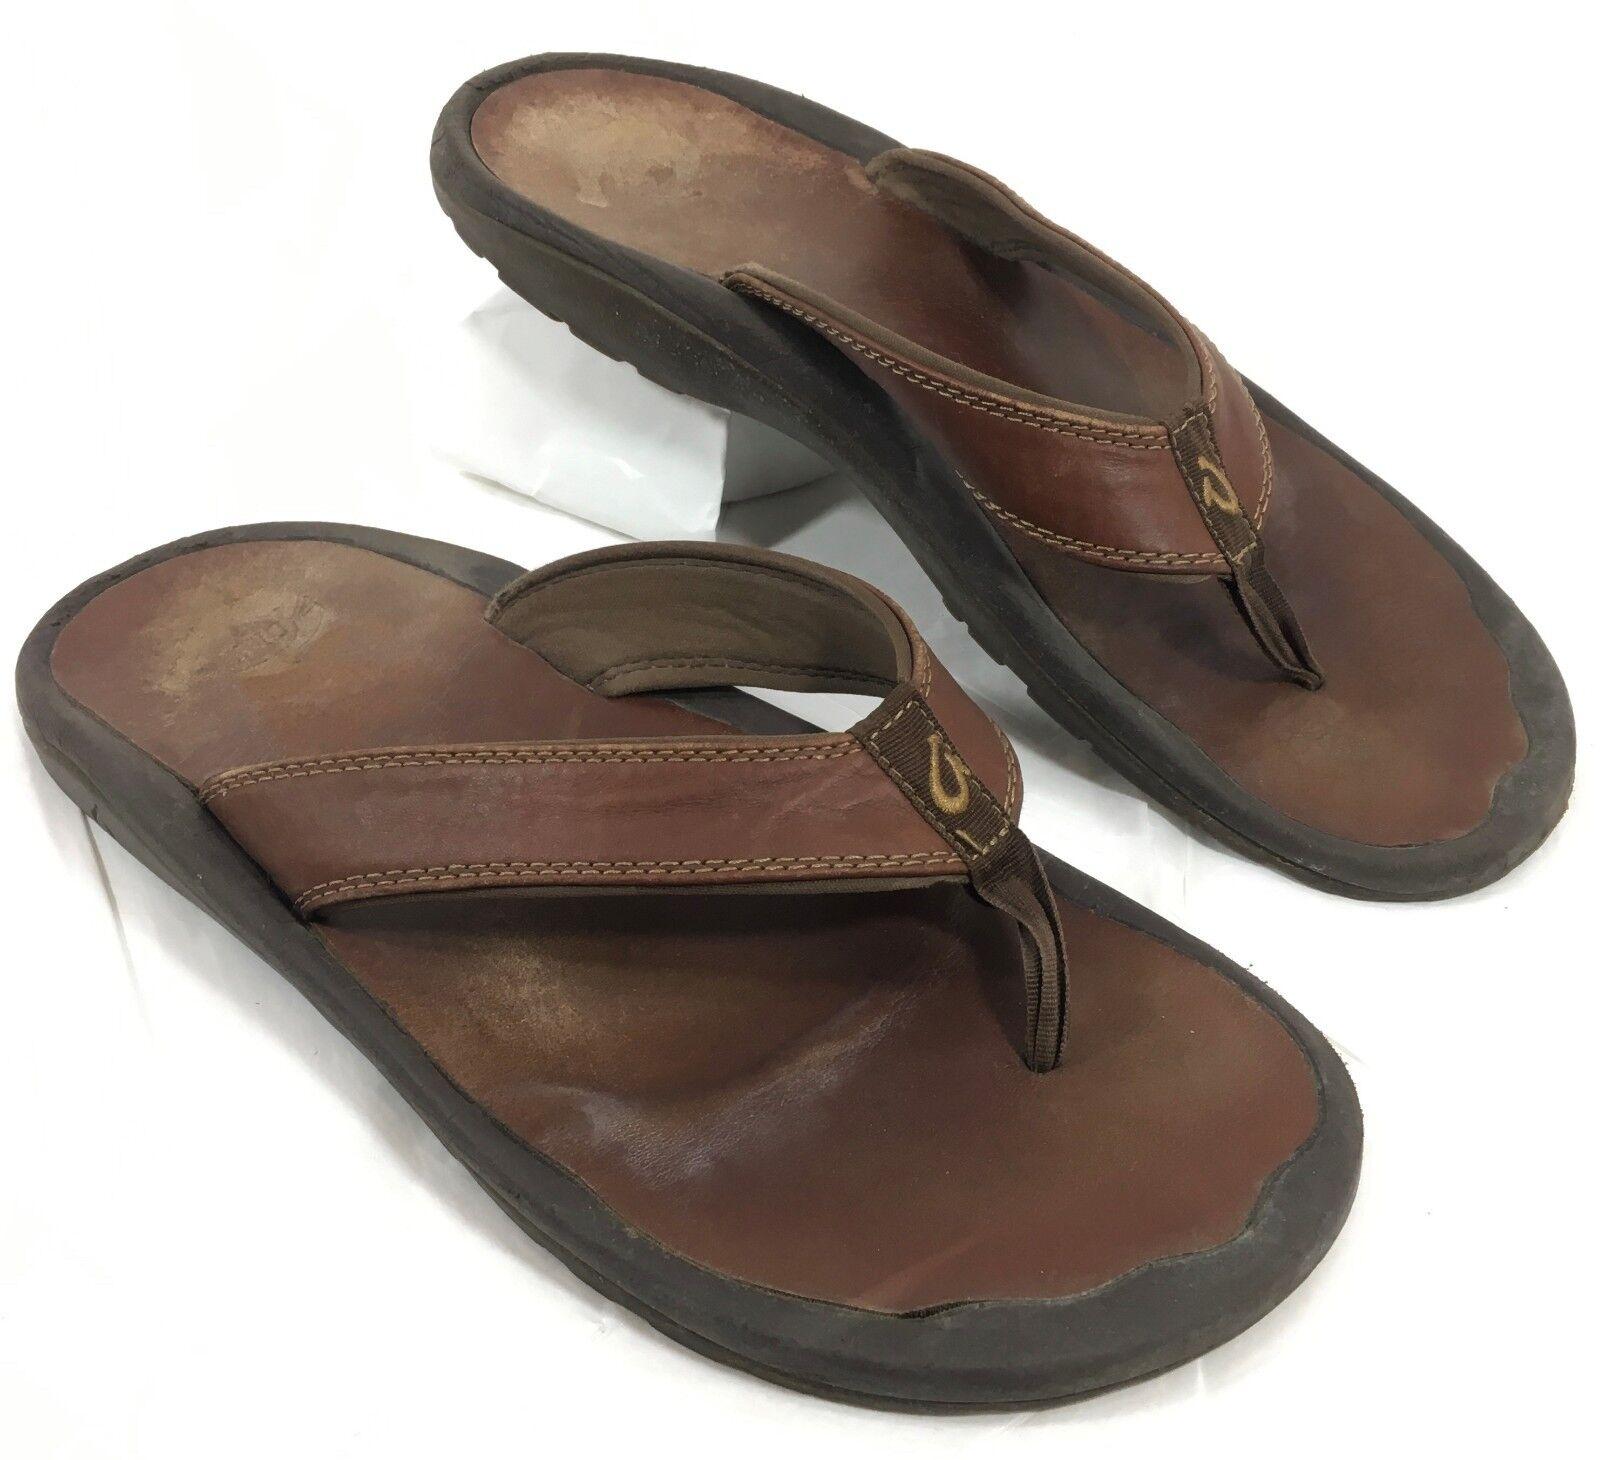 Men's Olukai Flip Flops Sandals Brown leather OHANA Sz 12